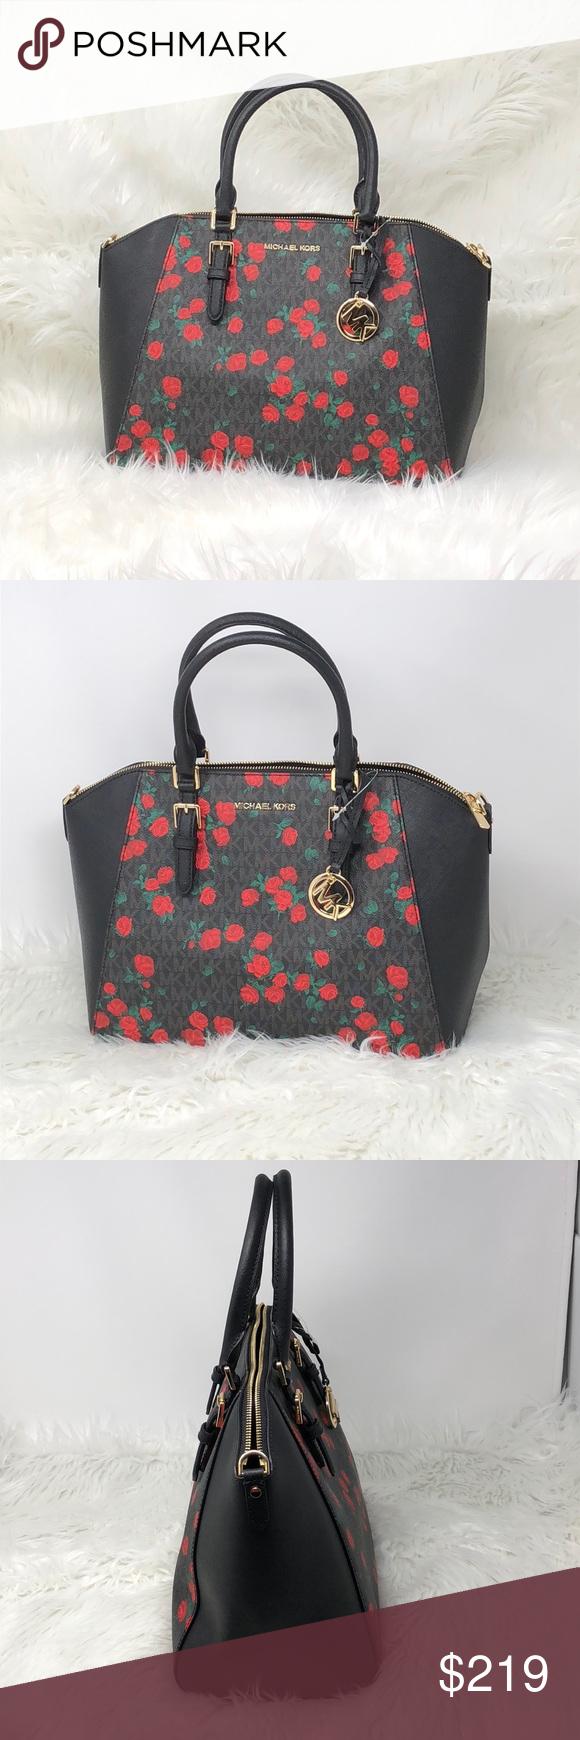 4878220a1d39 Nwt Michael kors Ciara black/red large satchel Saffiano leather Top Zip  Closure Satchel Messsenger